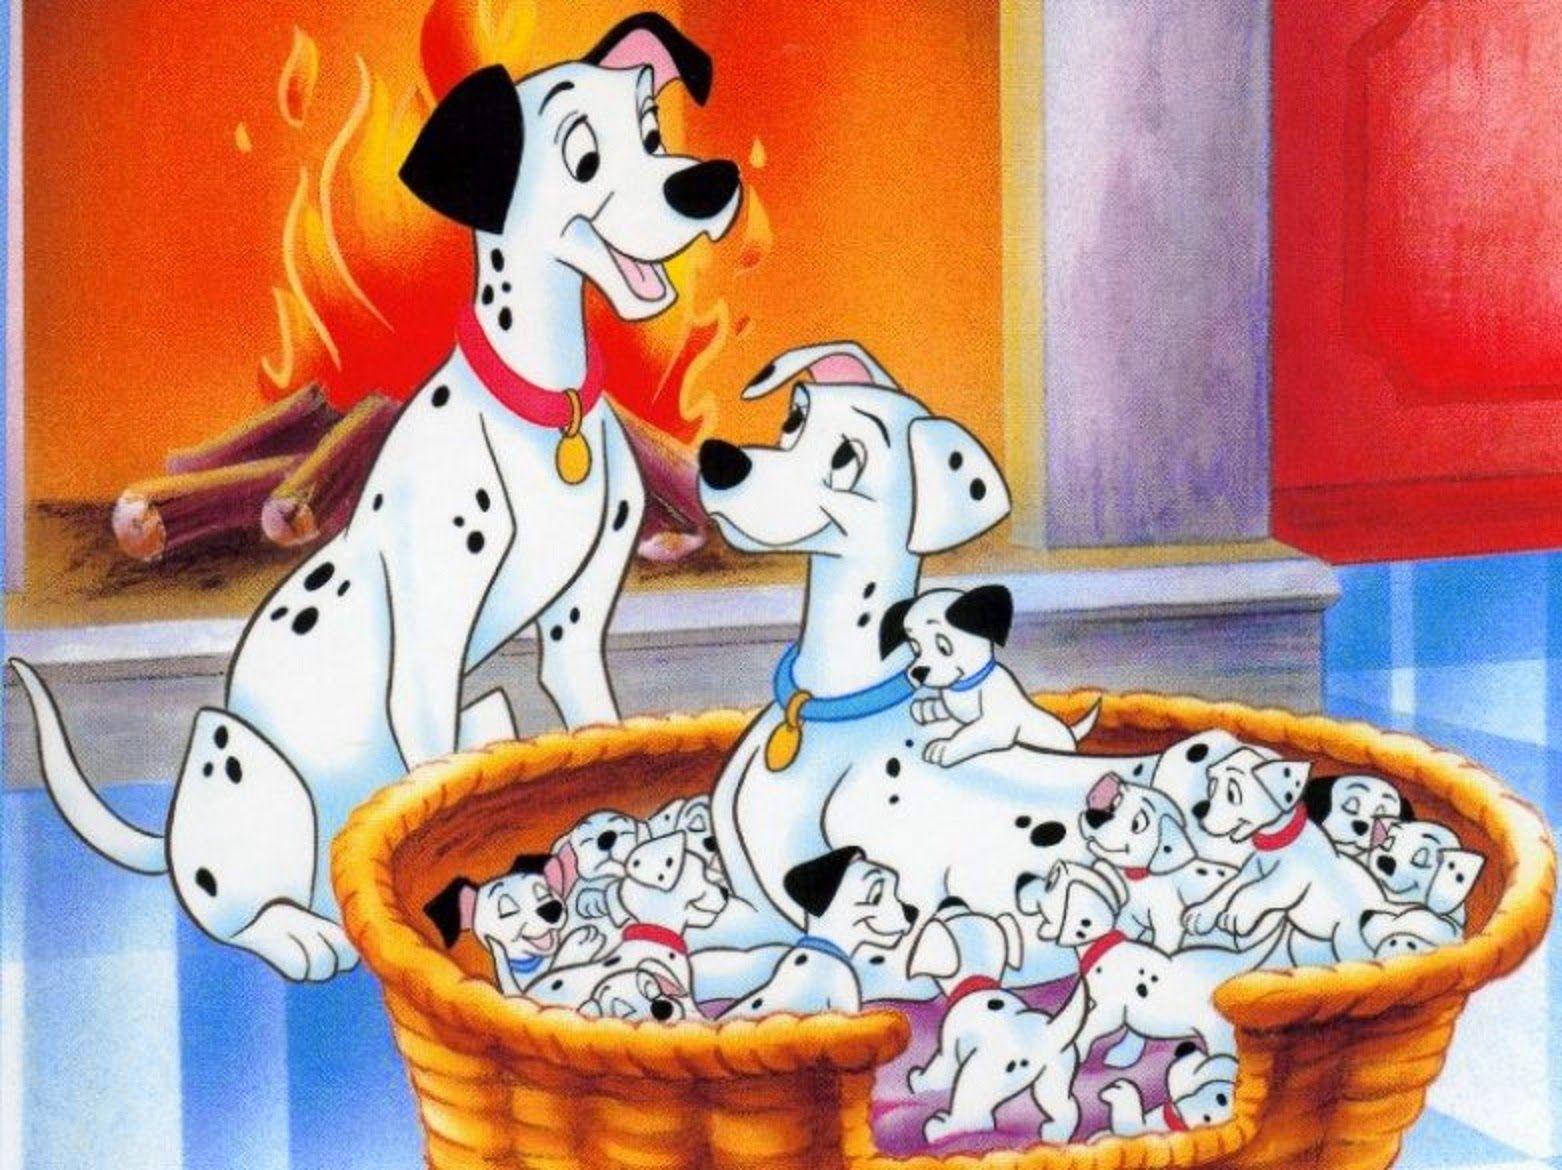 Beautiful Disney Cartoon 101 Dalmatians Wallpapers Free Download 101 Dalmatiner Disney Filme Disney Animation